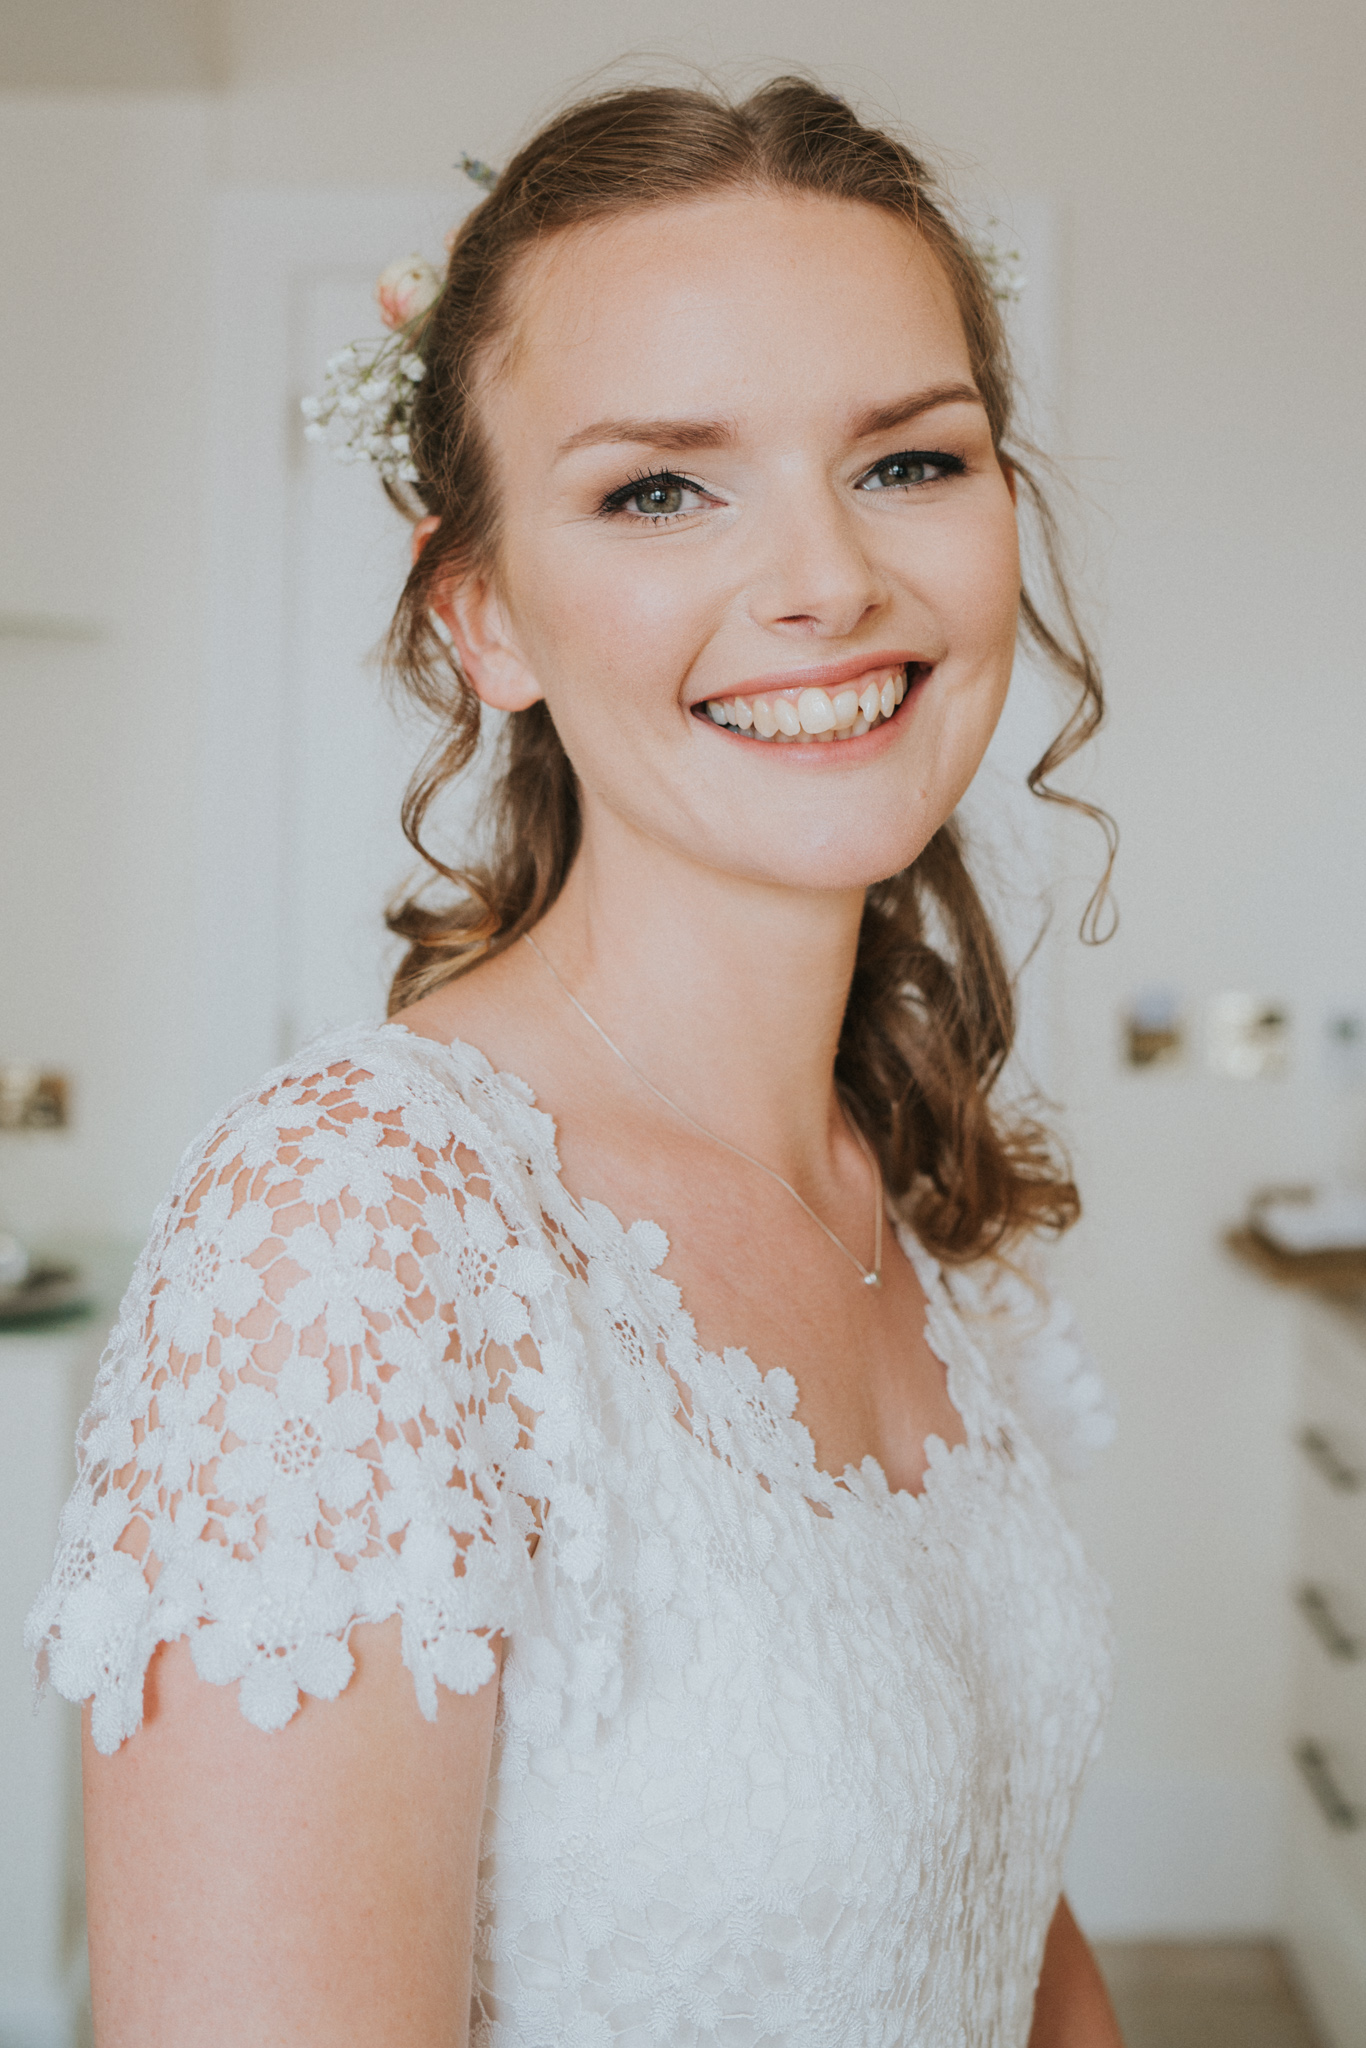 Georgie-Ketu-Firstsite-Wedding-Colchester-Essex-Grace-Elizabeth-Alternative-Wedding-Photographer (9 of 20).jpg